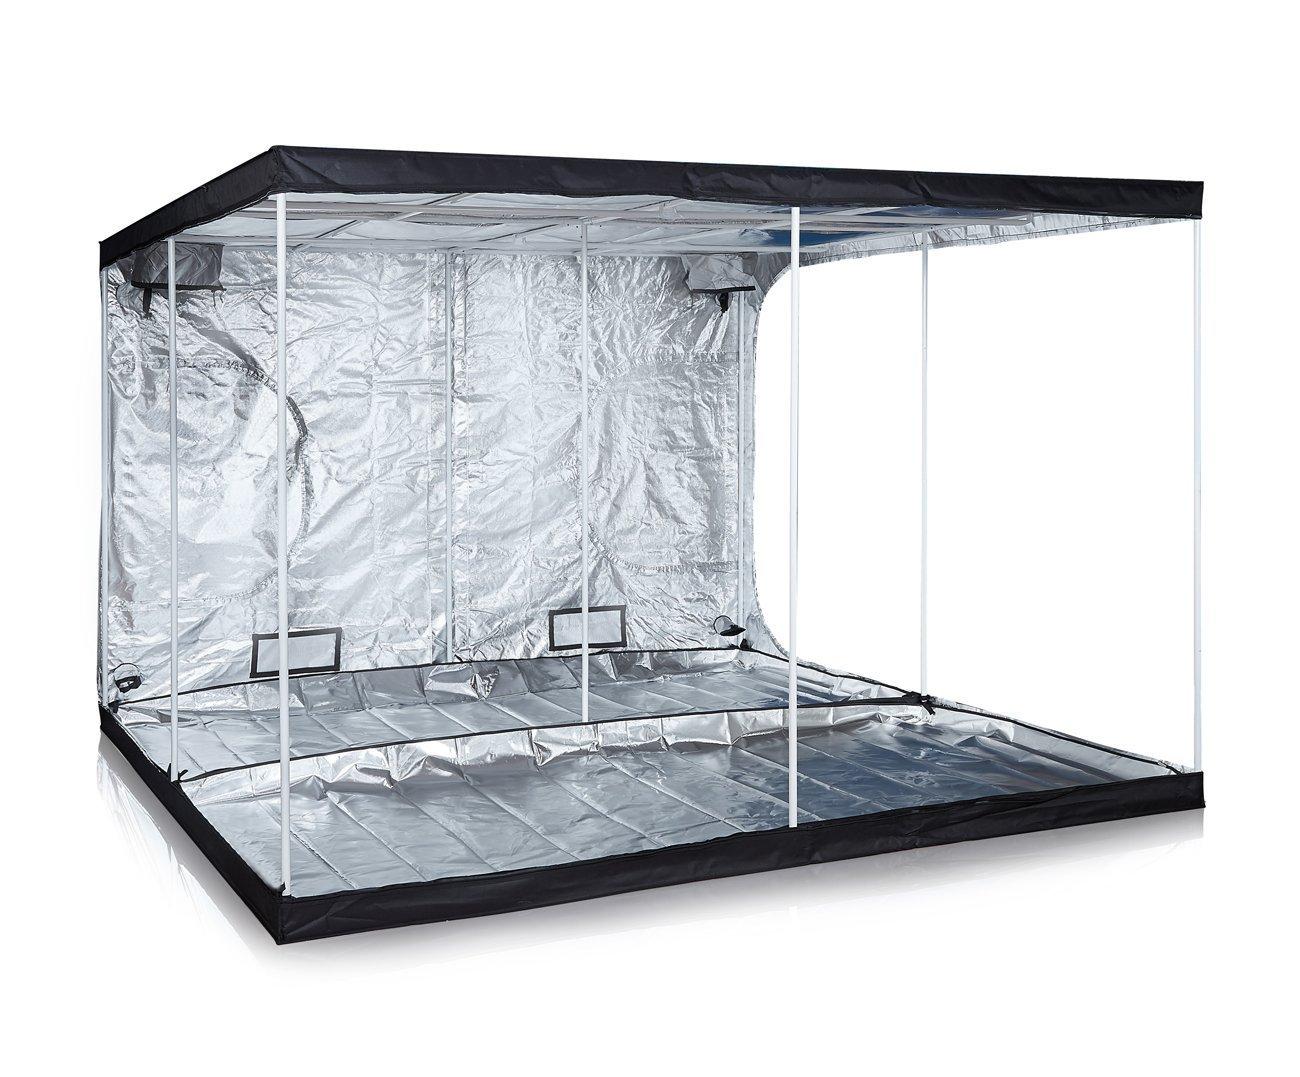 96x96x78 Inches 100% Reflective Waterproof Interior Diamond Mylar Grow Tent Non Toxic Room w/Door Windows for Indoor Home Plant Growing